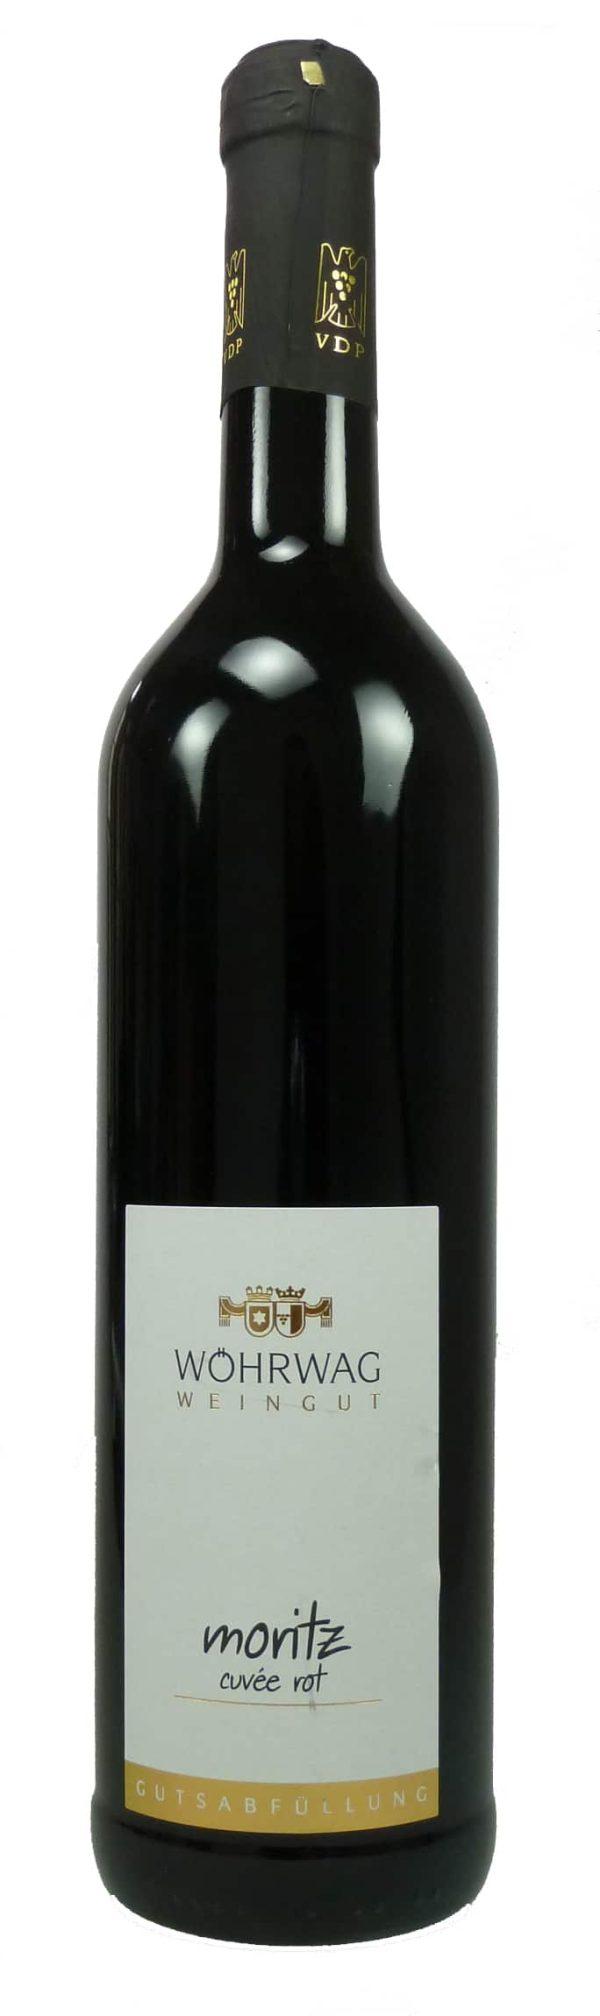 Moritz Rotweincuvée Qualitätswein trocken 2017